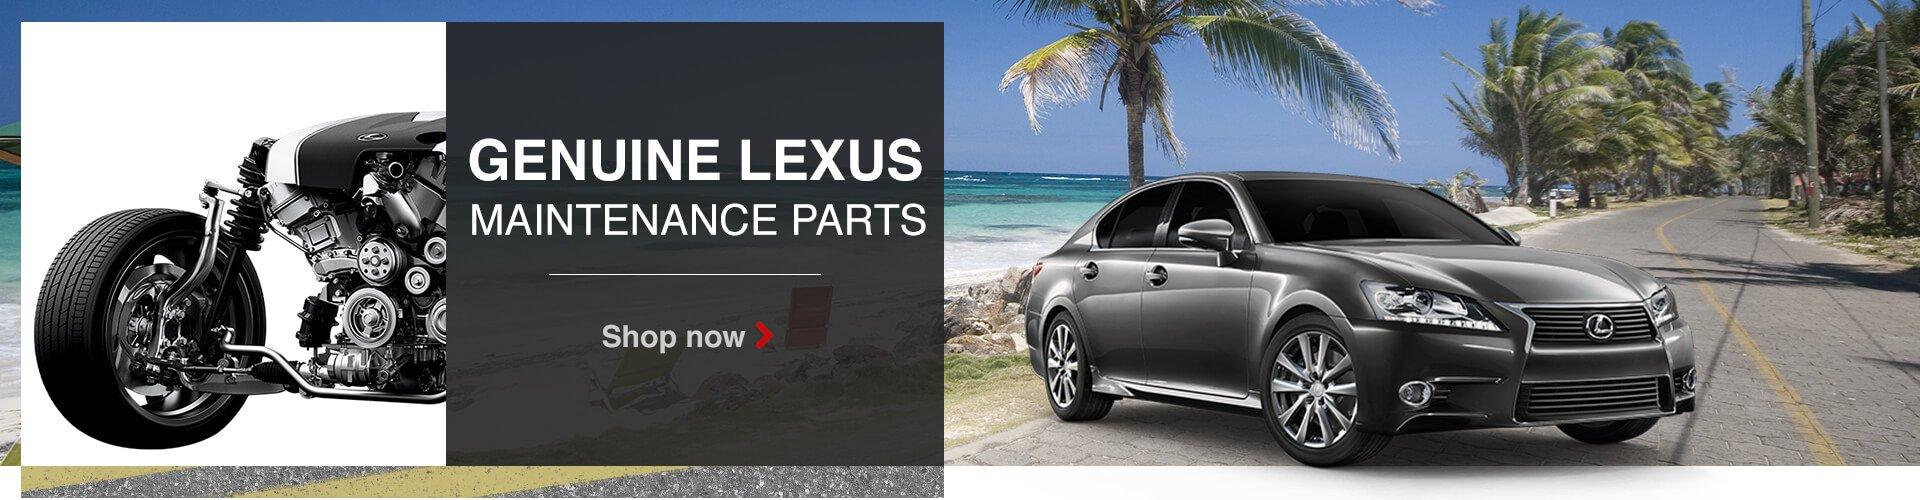 Genuine Lexus Maintenance Parts